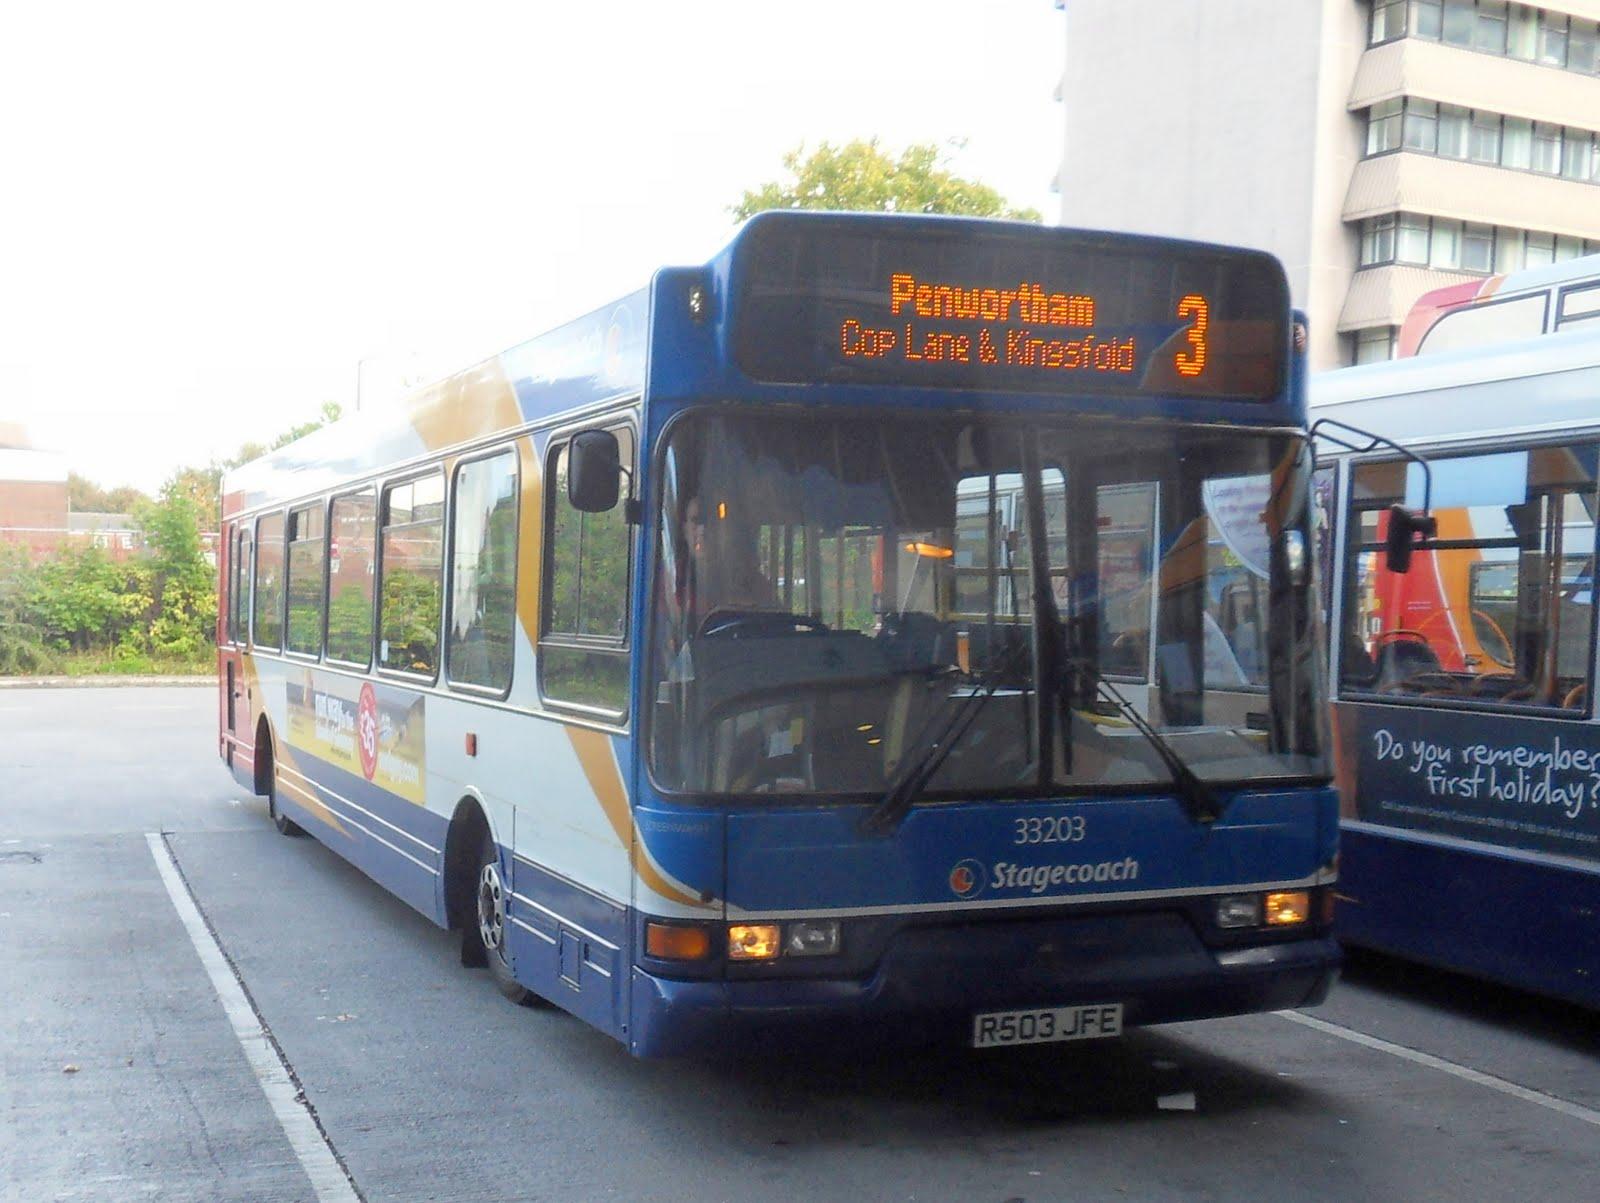 Kevs Bus Amp Tram Blog Week 1038 Southport Preston Amp Blackpool